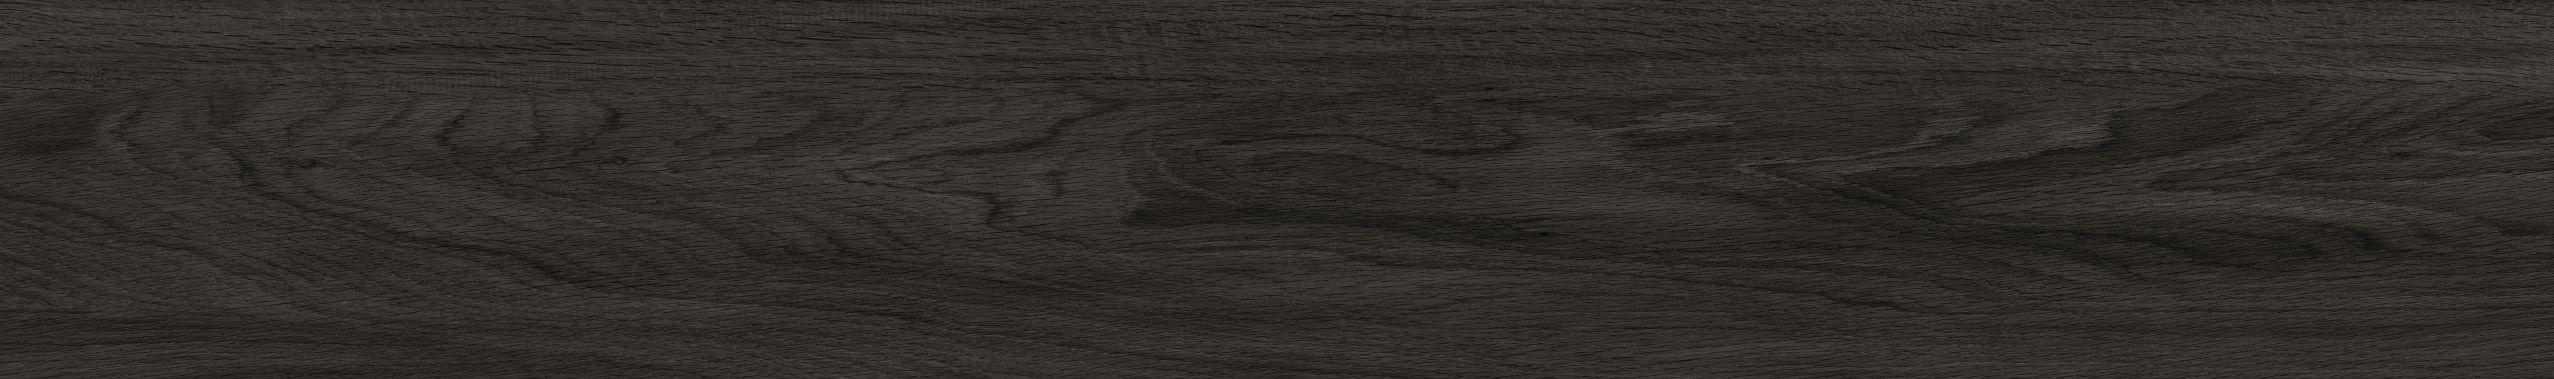 Panele winylowe LVT modulari ® WOOD DRYBACK 19,6 x 132 cm 24983